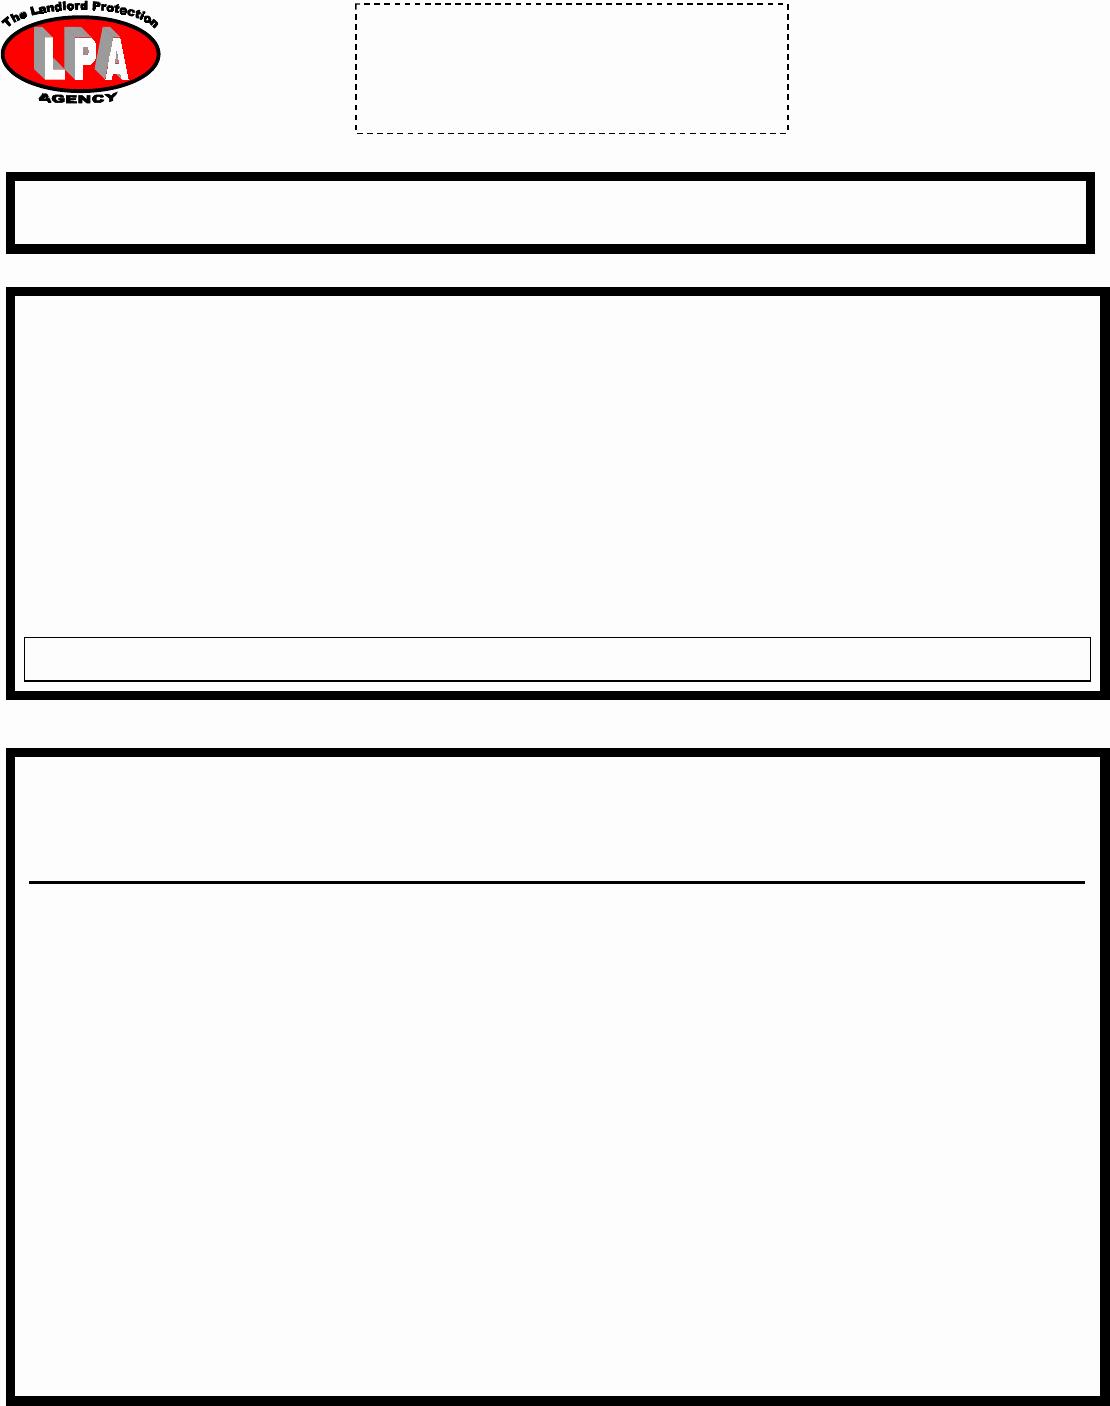 Work order Template Excel Fresh Download Maintenance Work order Template Excel for Free